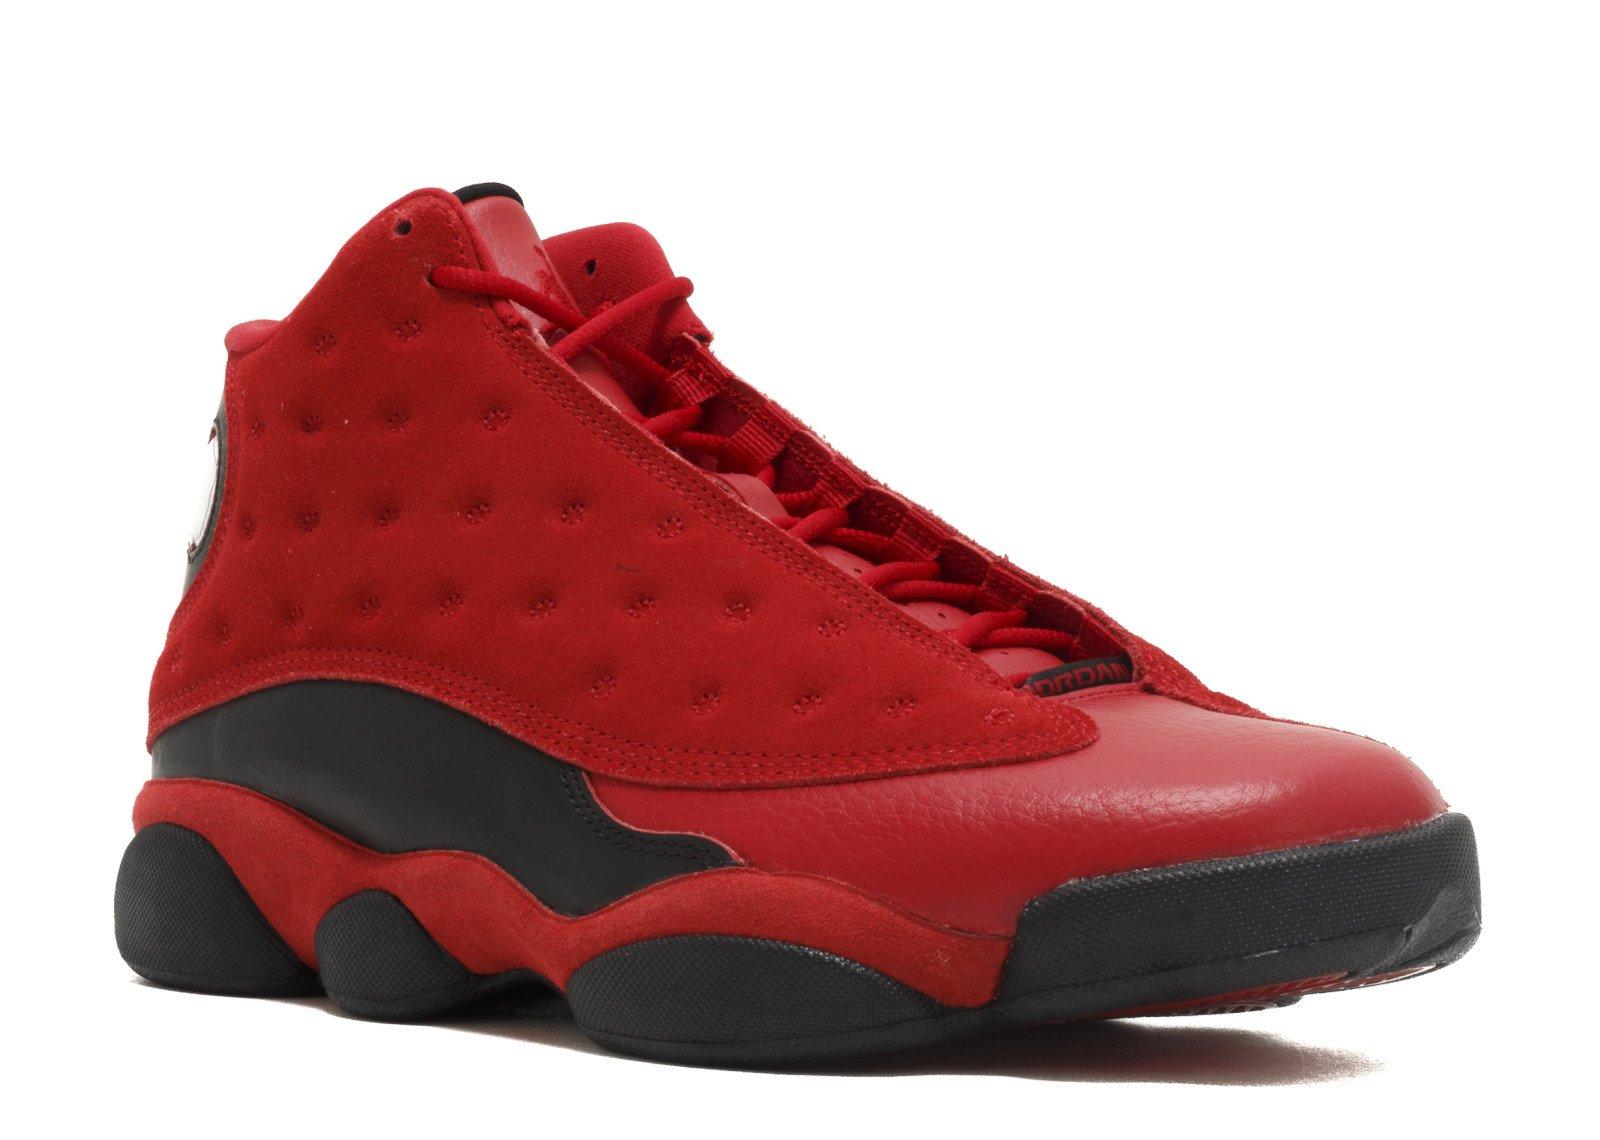 472ecd970fef7e Galleon - Nike Air Jordan 13 Retro Single Day China Exclusive Gym Red Black 888164  601 Mens Sz 10 Us